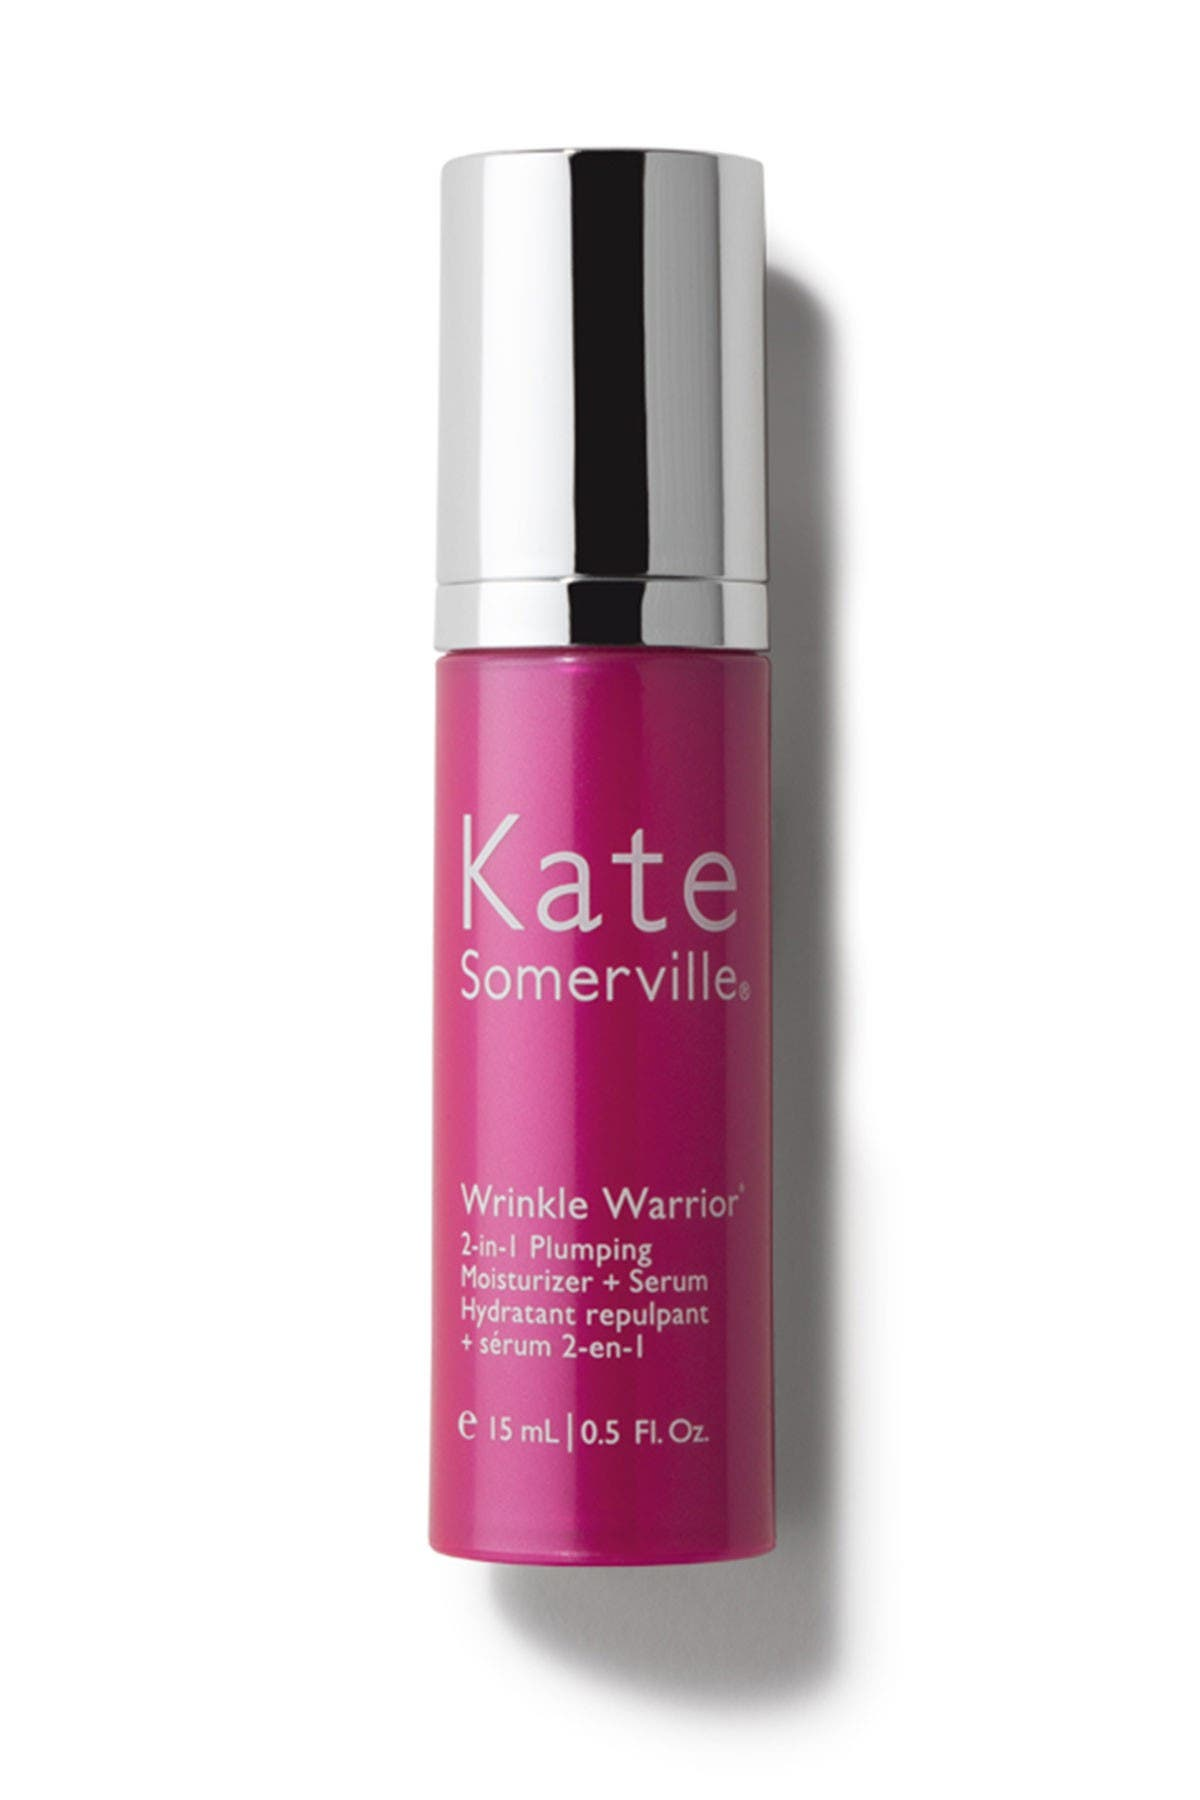 Image of Kate Somerville Wrinkle Warrior 2-in-1 Plumping Moisturizer + Serum Mini